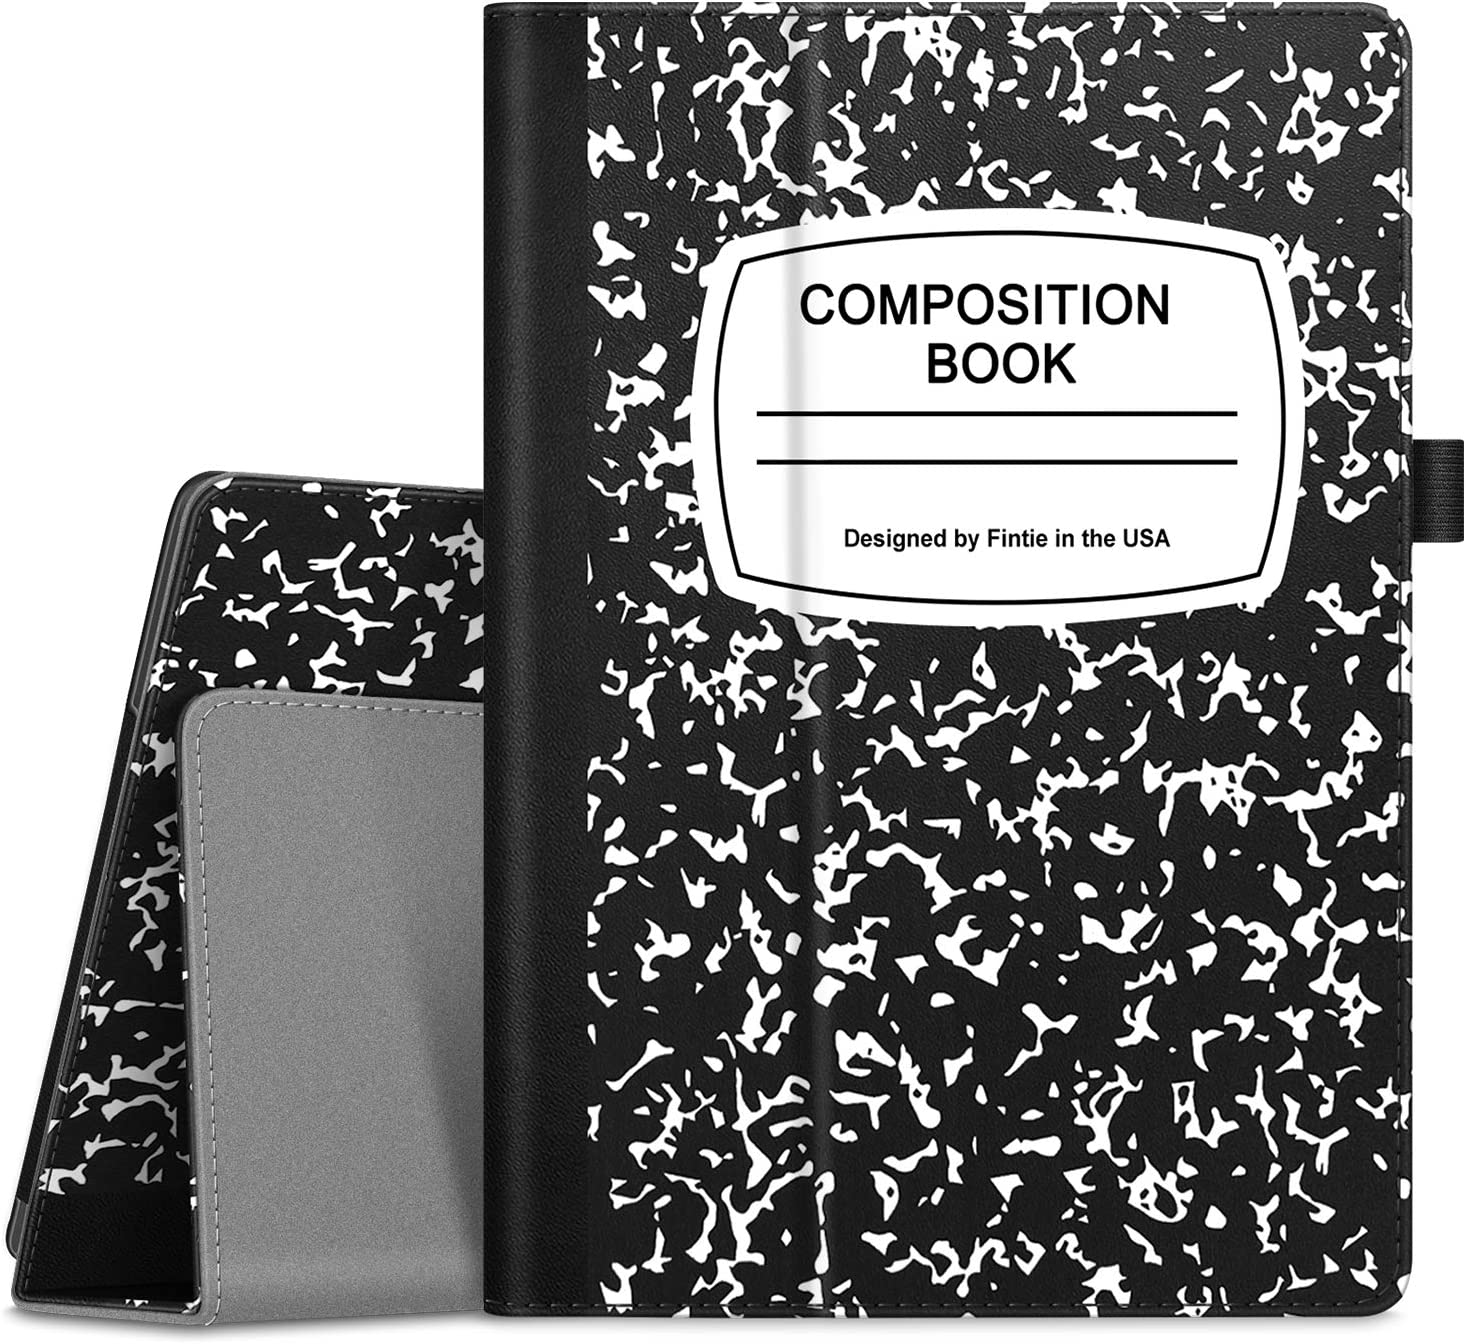 "Fintie Case for Lenovo Smart Tab M10 HD / P10 / M10 - Premium PU Leather Folio Cover for Lenovo Tab M10 HD TB-X505F TB-X505L / P10 TB-X705F TB-X705L / M10 TB-X605F 10.1"" Tablet, Composition Book Black"